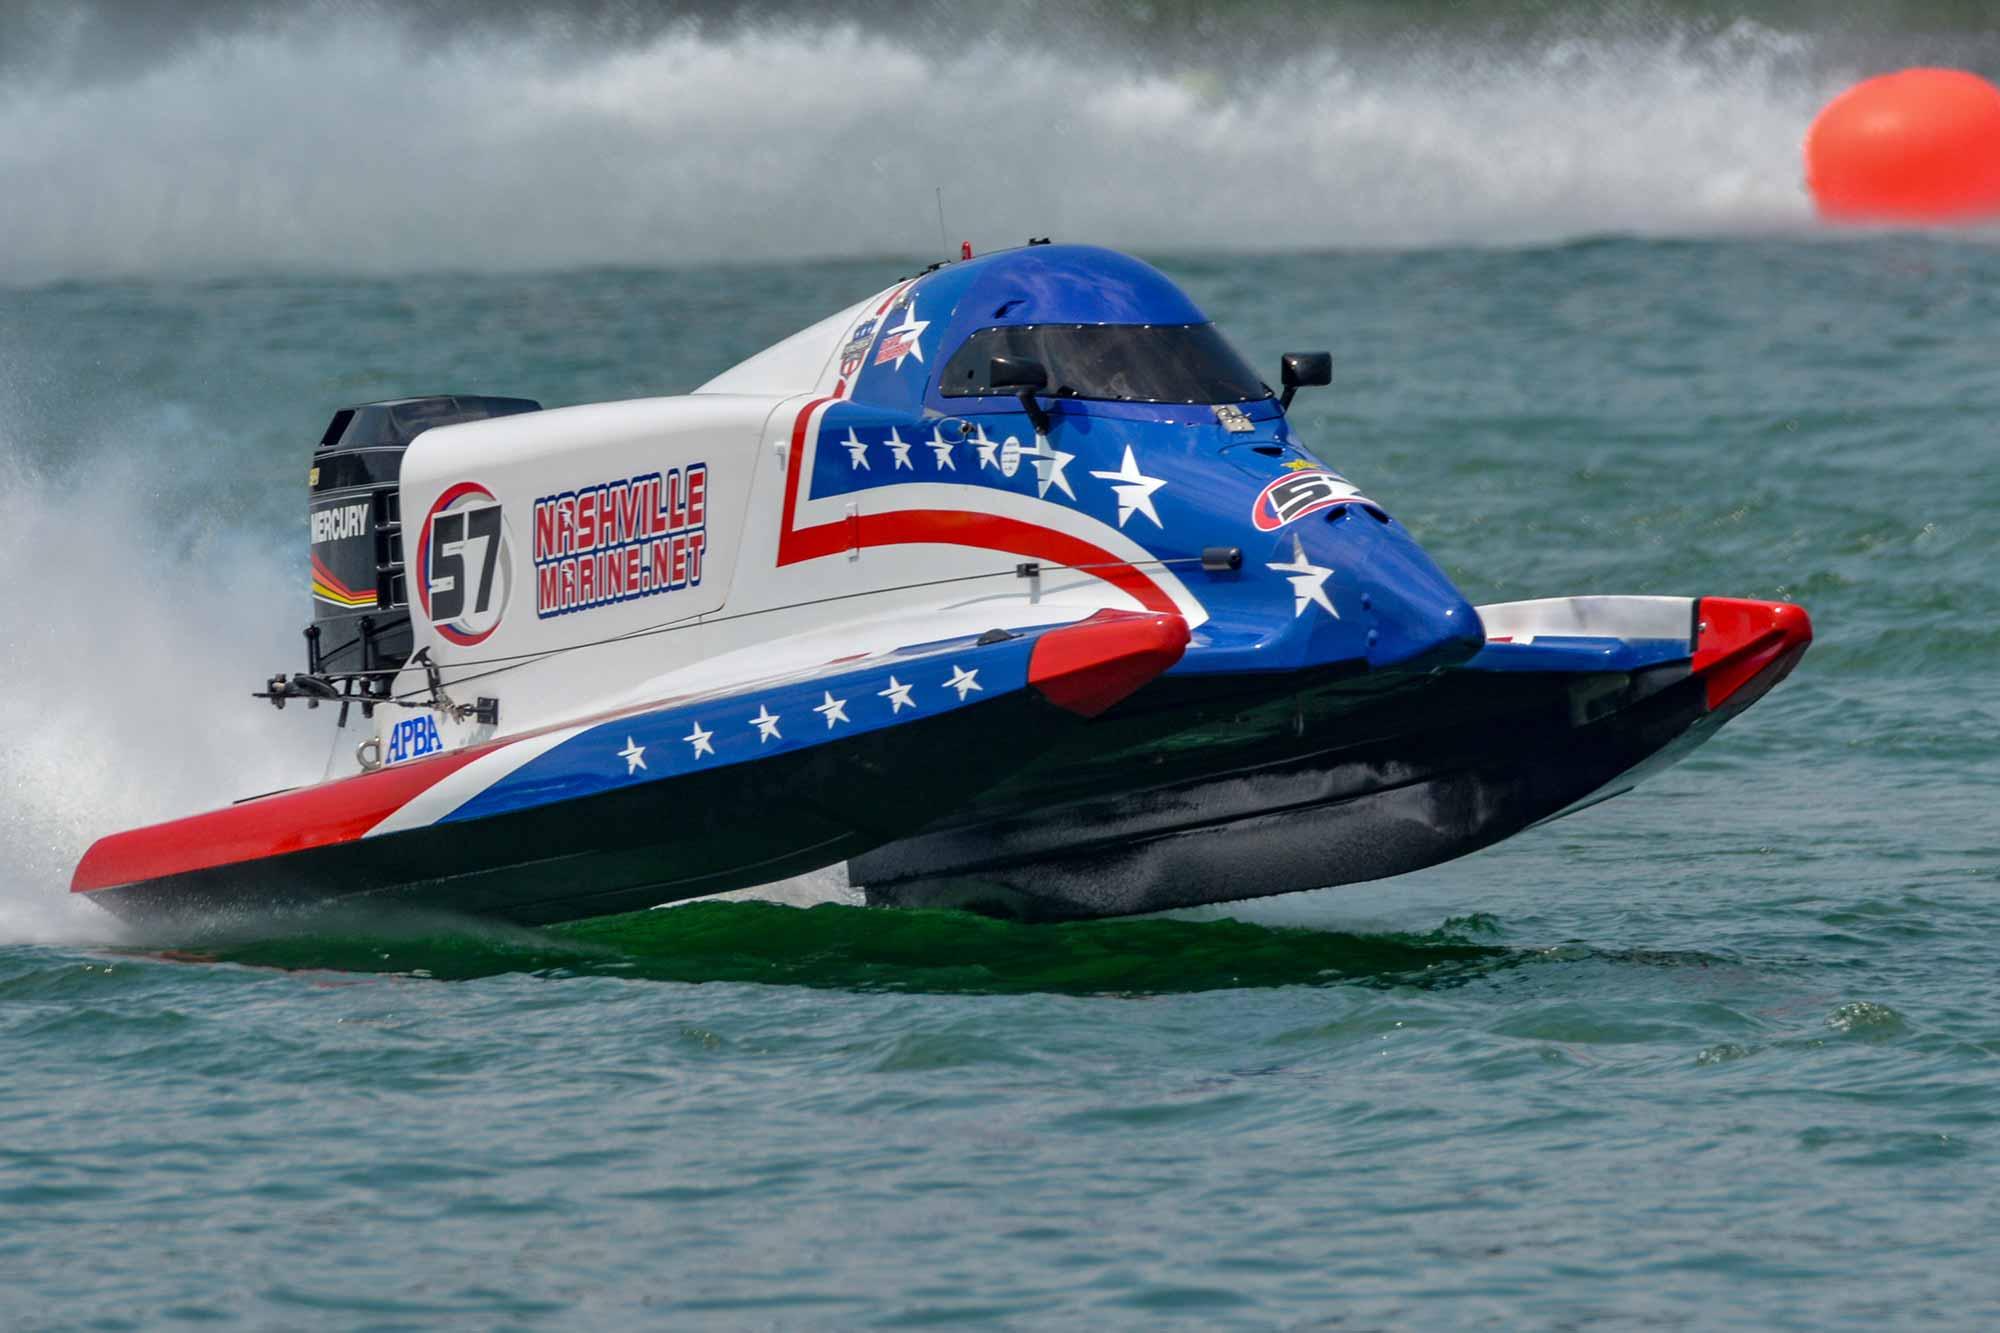 McMurray-Racing-Nashvill-Marine-2021-Springfield-F1-Race-51